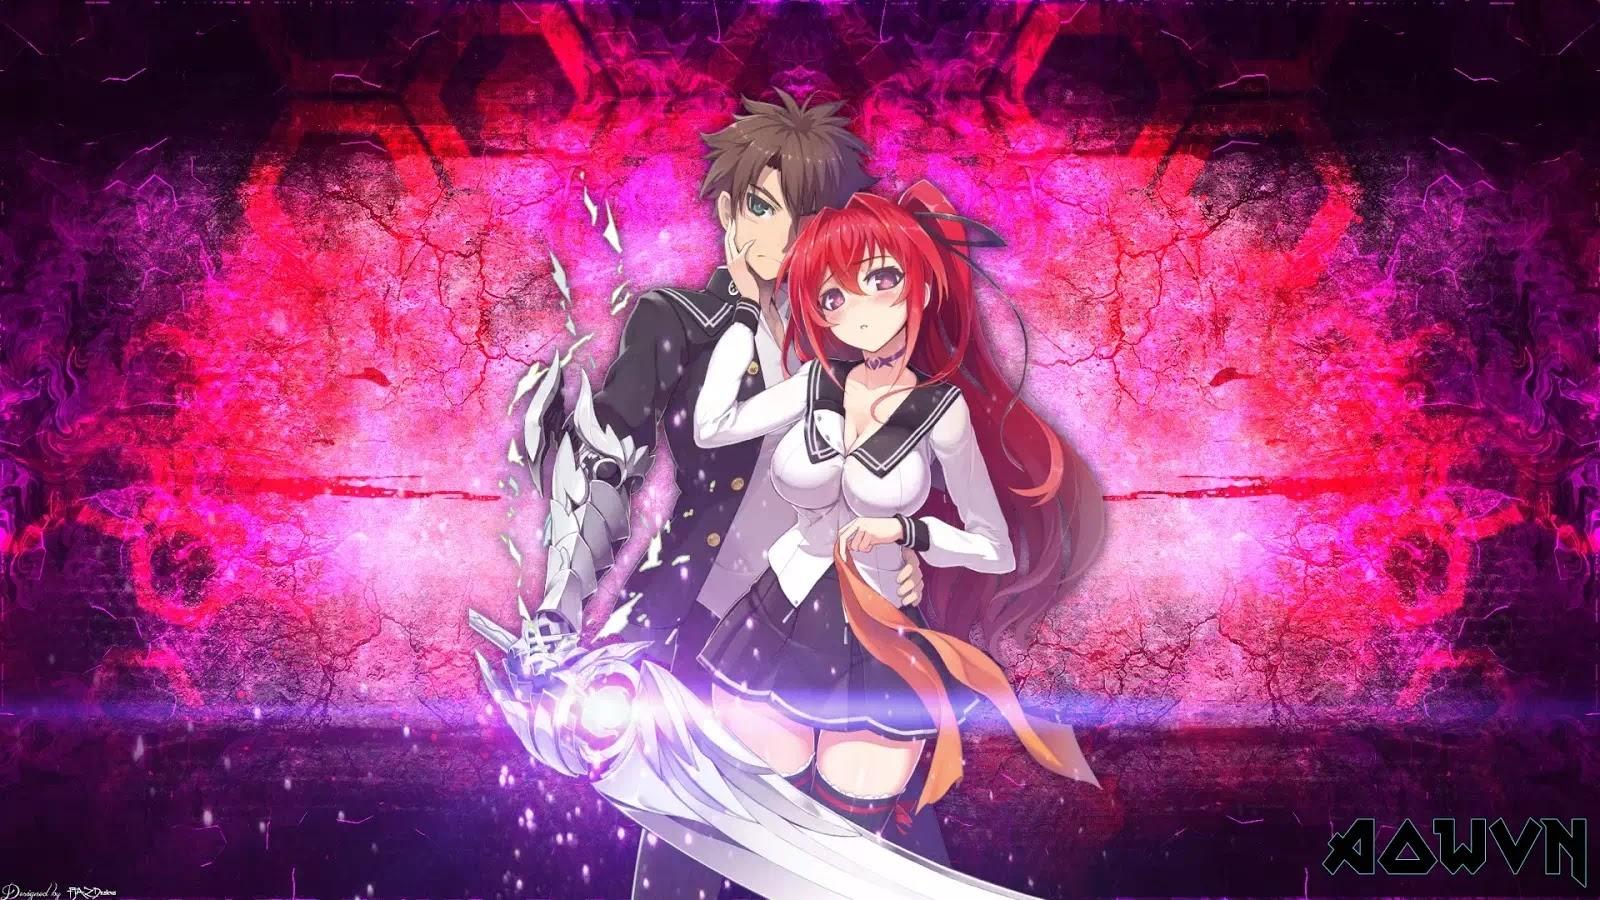 AowVN%2B%25281%2529 - [ Anime 3gp Mp4 ] Shinmai Maou no Testament BD SS1 + SS2 + OVA | Vietsub Ecchi Harem 17+